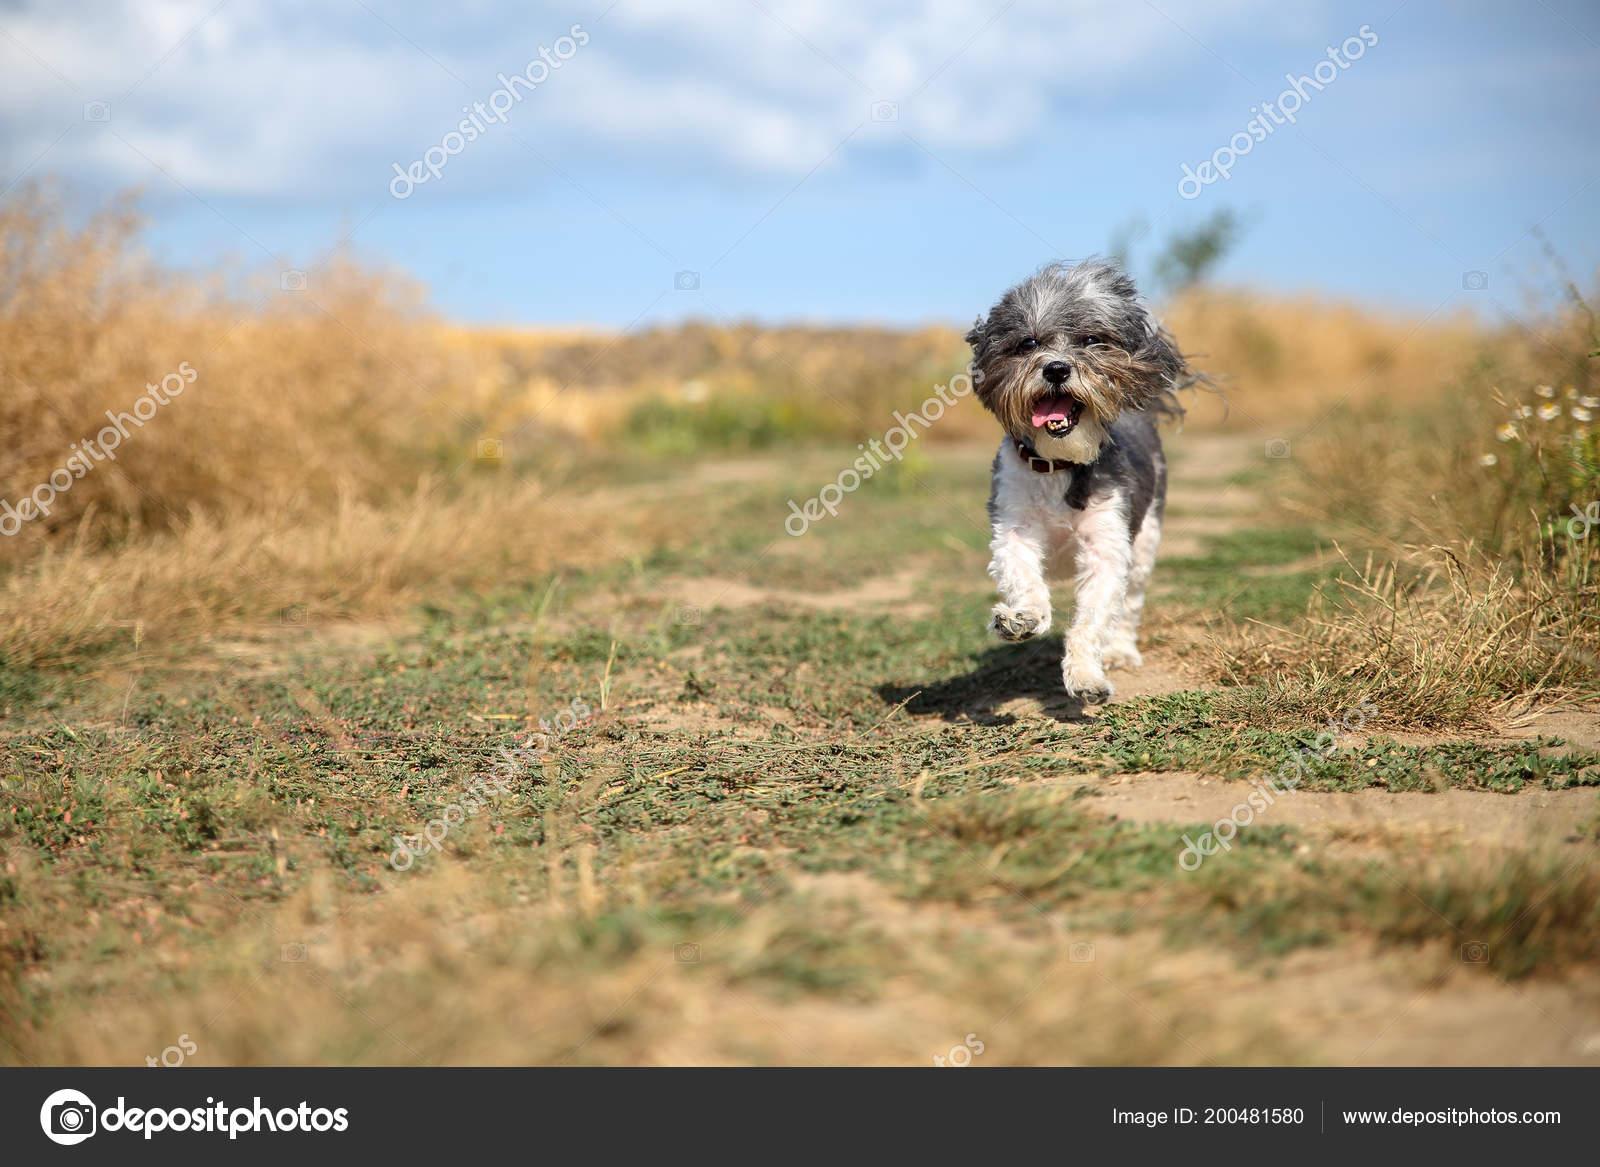 Cute Bichon Havanese Dog Summer Haircut Its Tongue Hanging Out